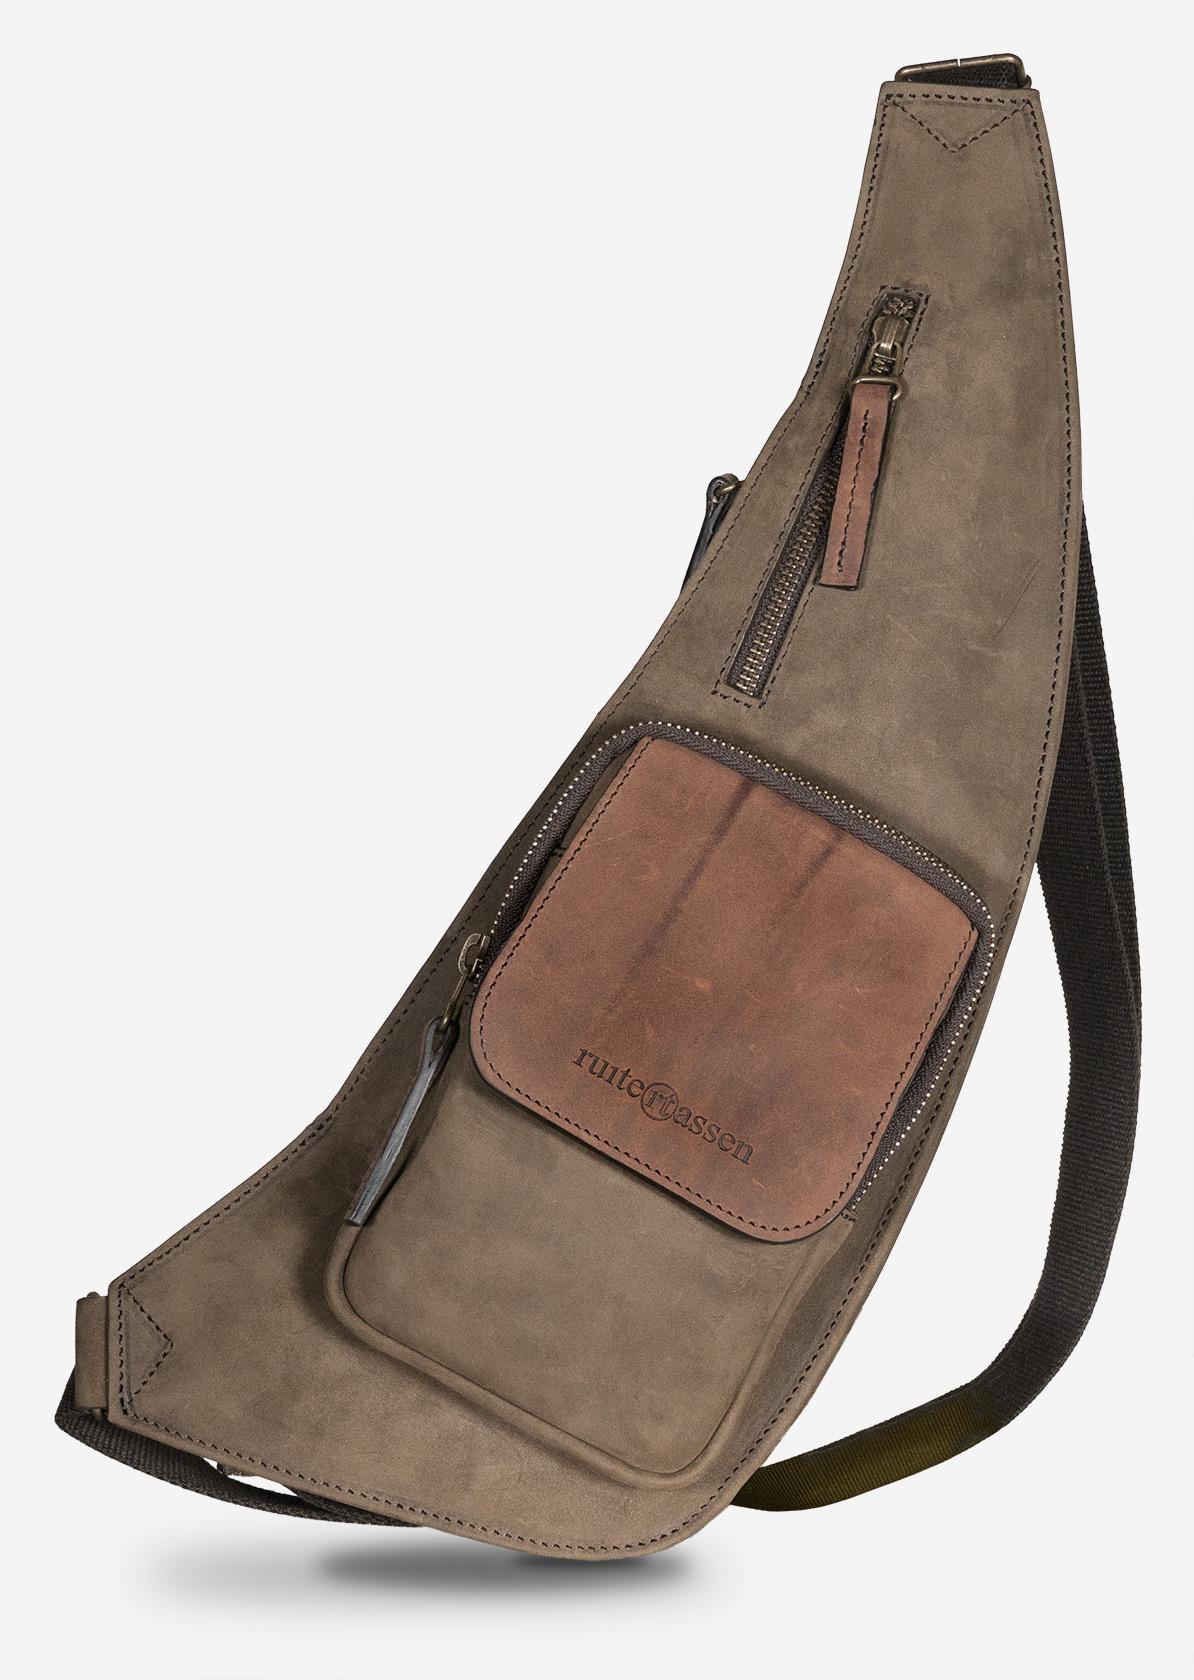 Sac bandoulière sling poitrine en cuir pleine fleur.